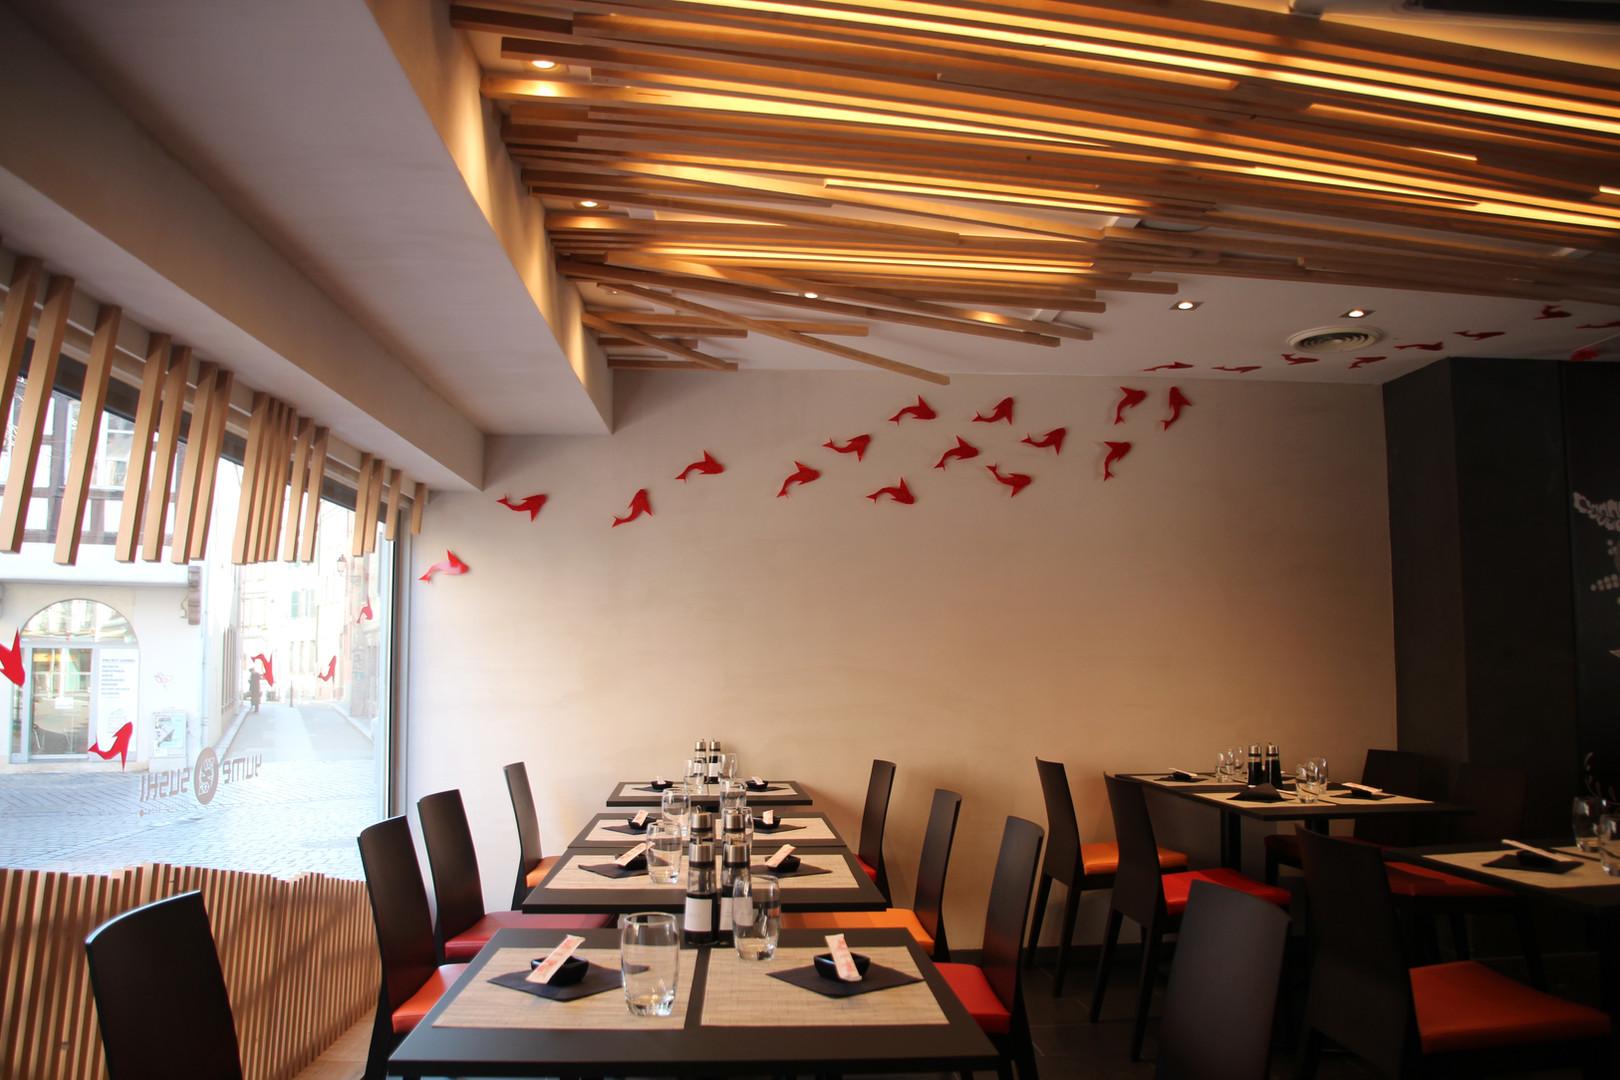 Les poissons et la salle du restaurant - Restaurant Yume Sushi à Strasbourg